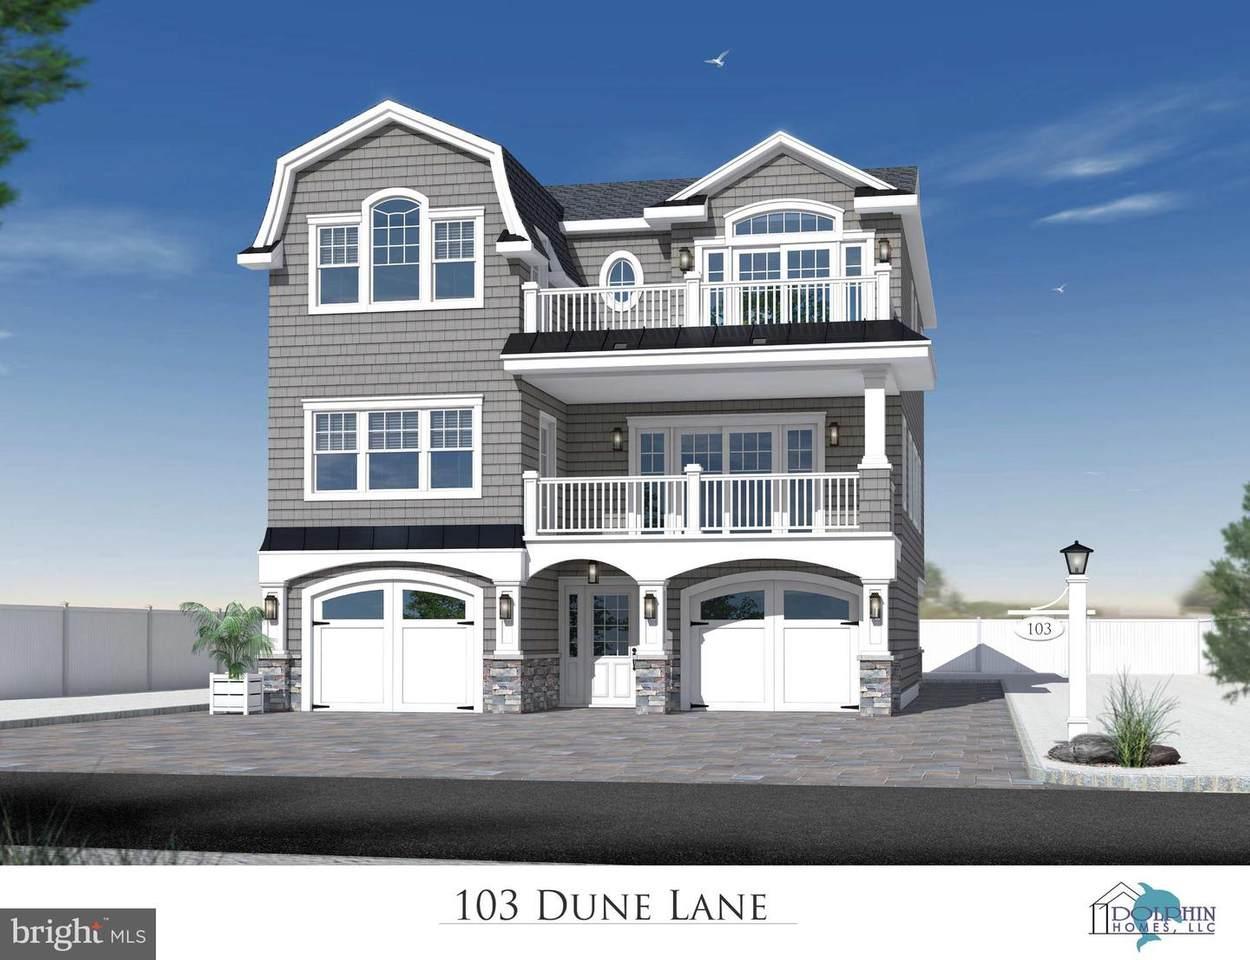 103 Dune Lane - Photo 1